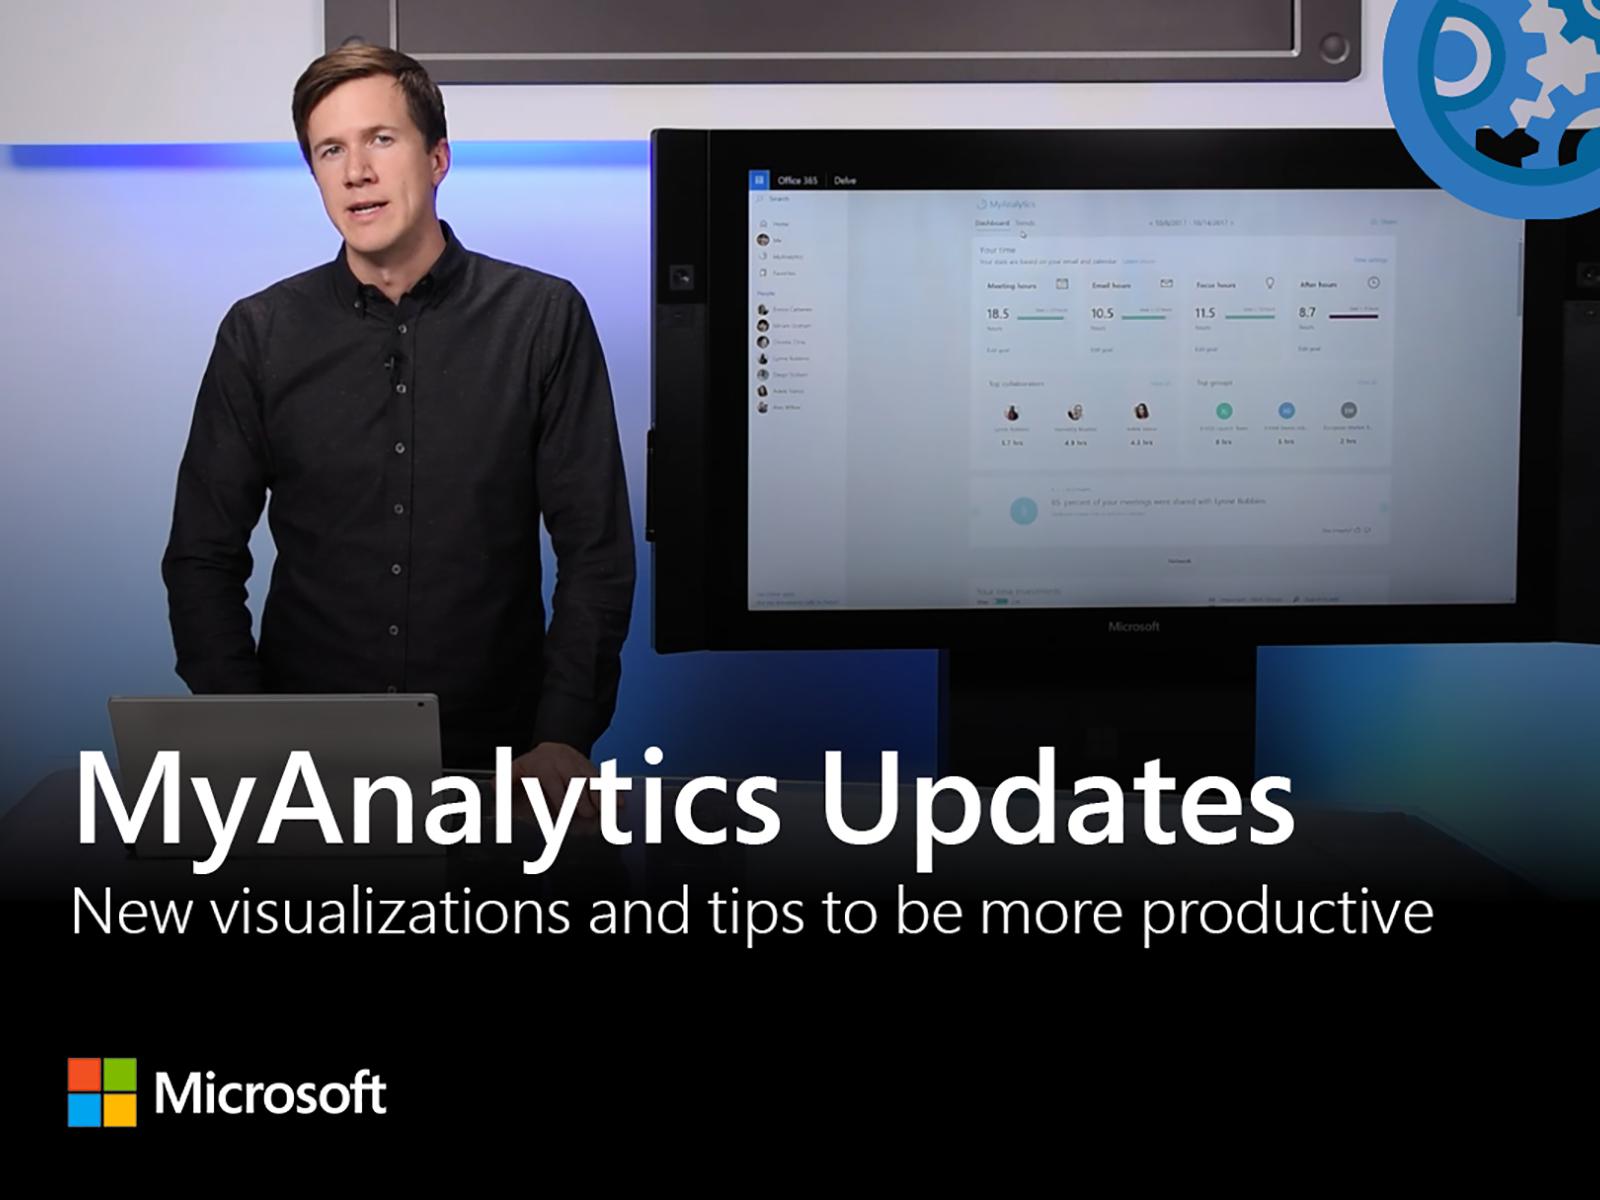 Artwork for Updates to MyAnalytics in Office 365